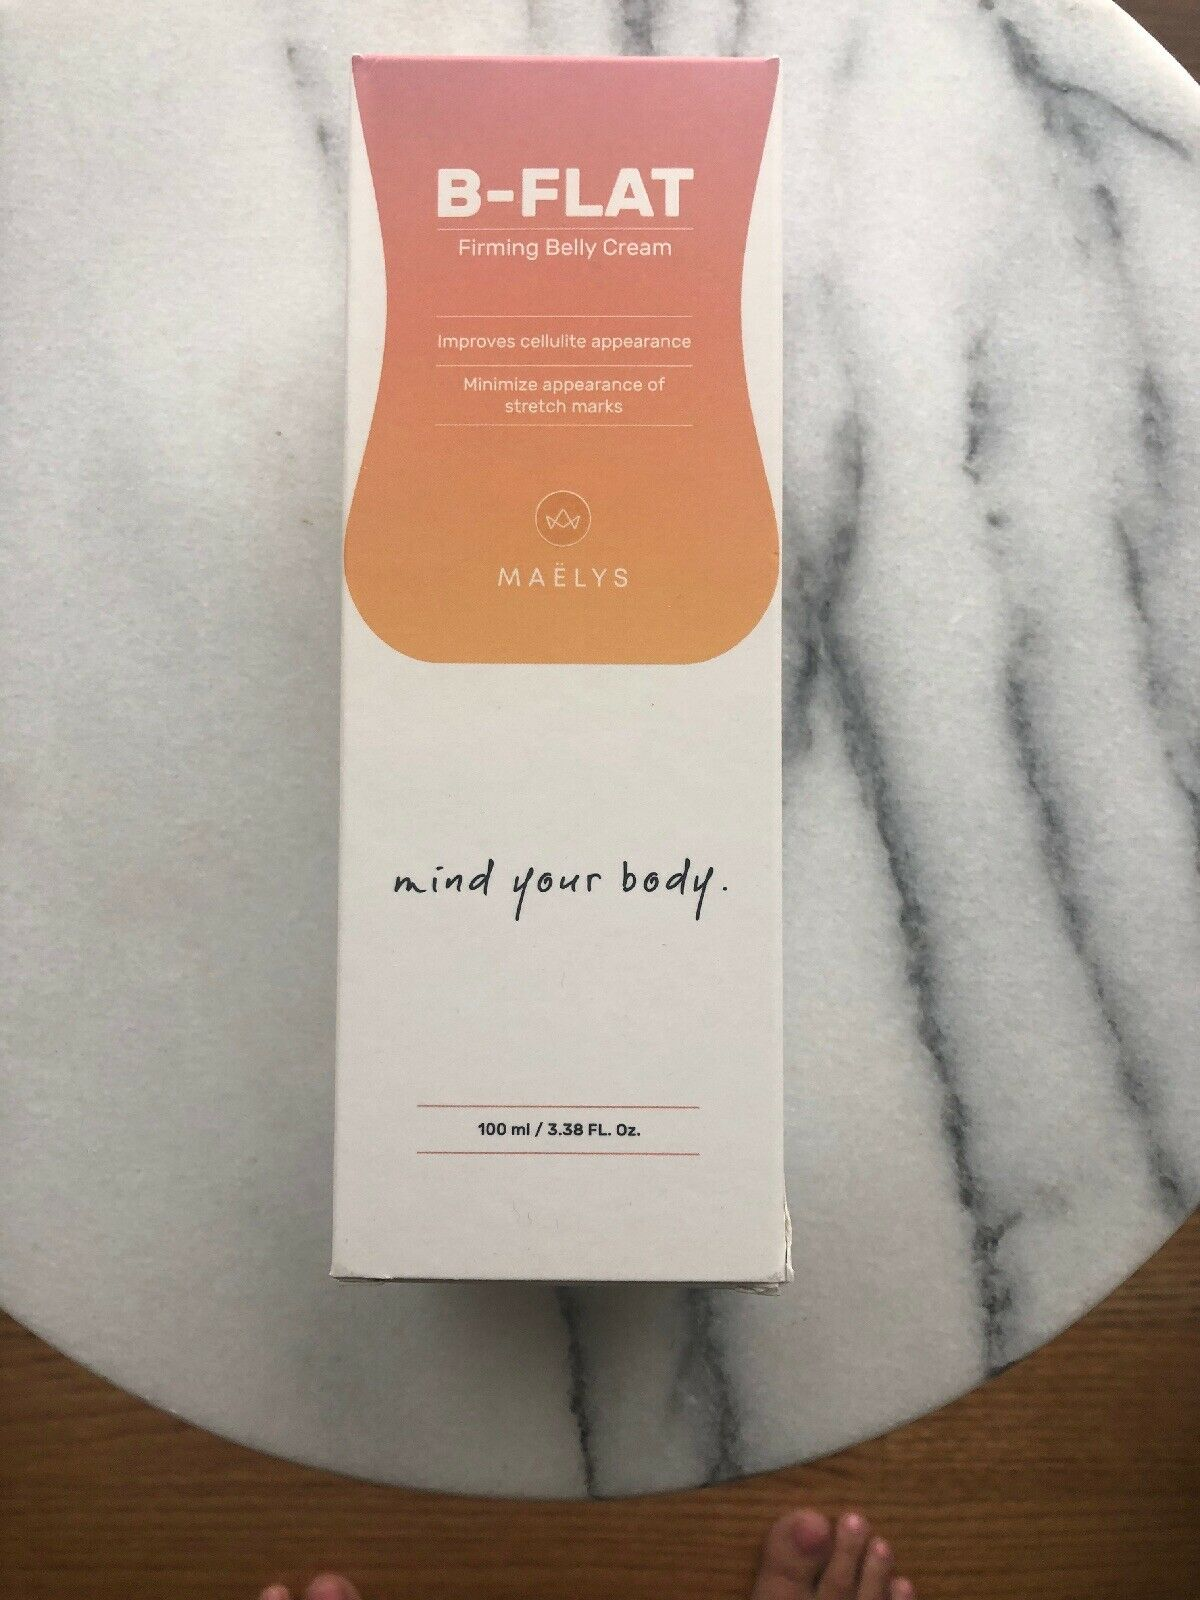 Maelys Cosmetics B Flat Belly Firming Cream For Sale Online Ebay